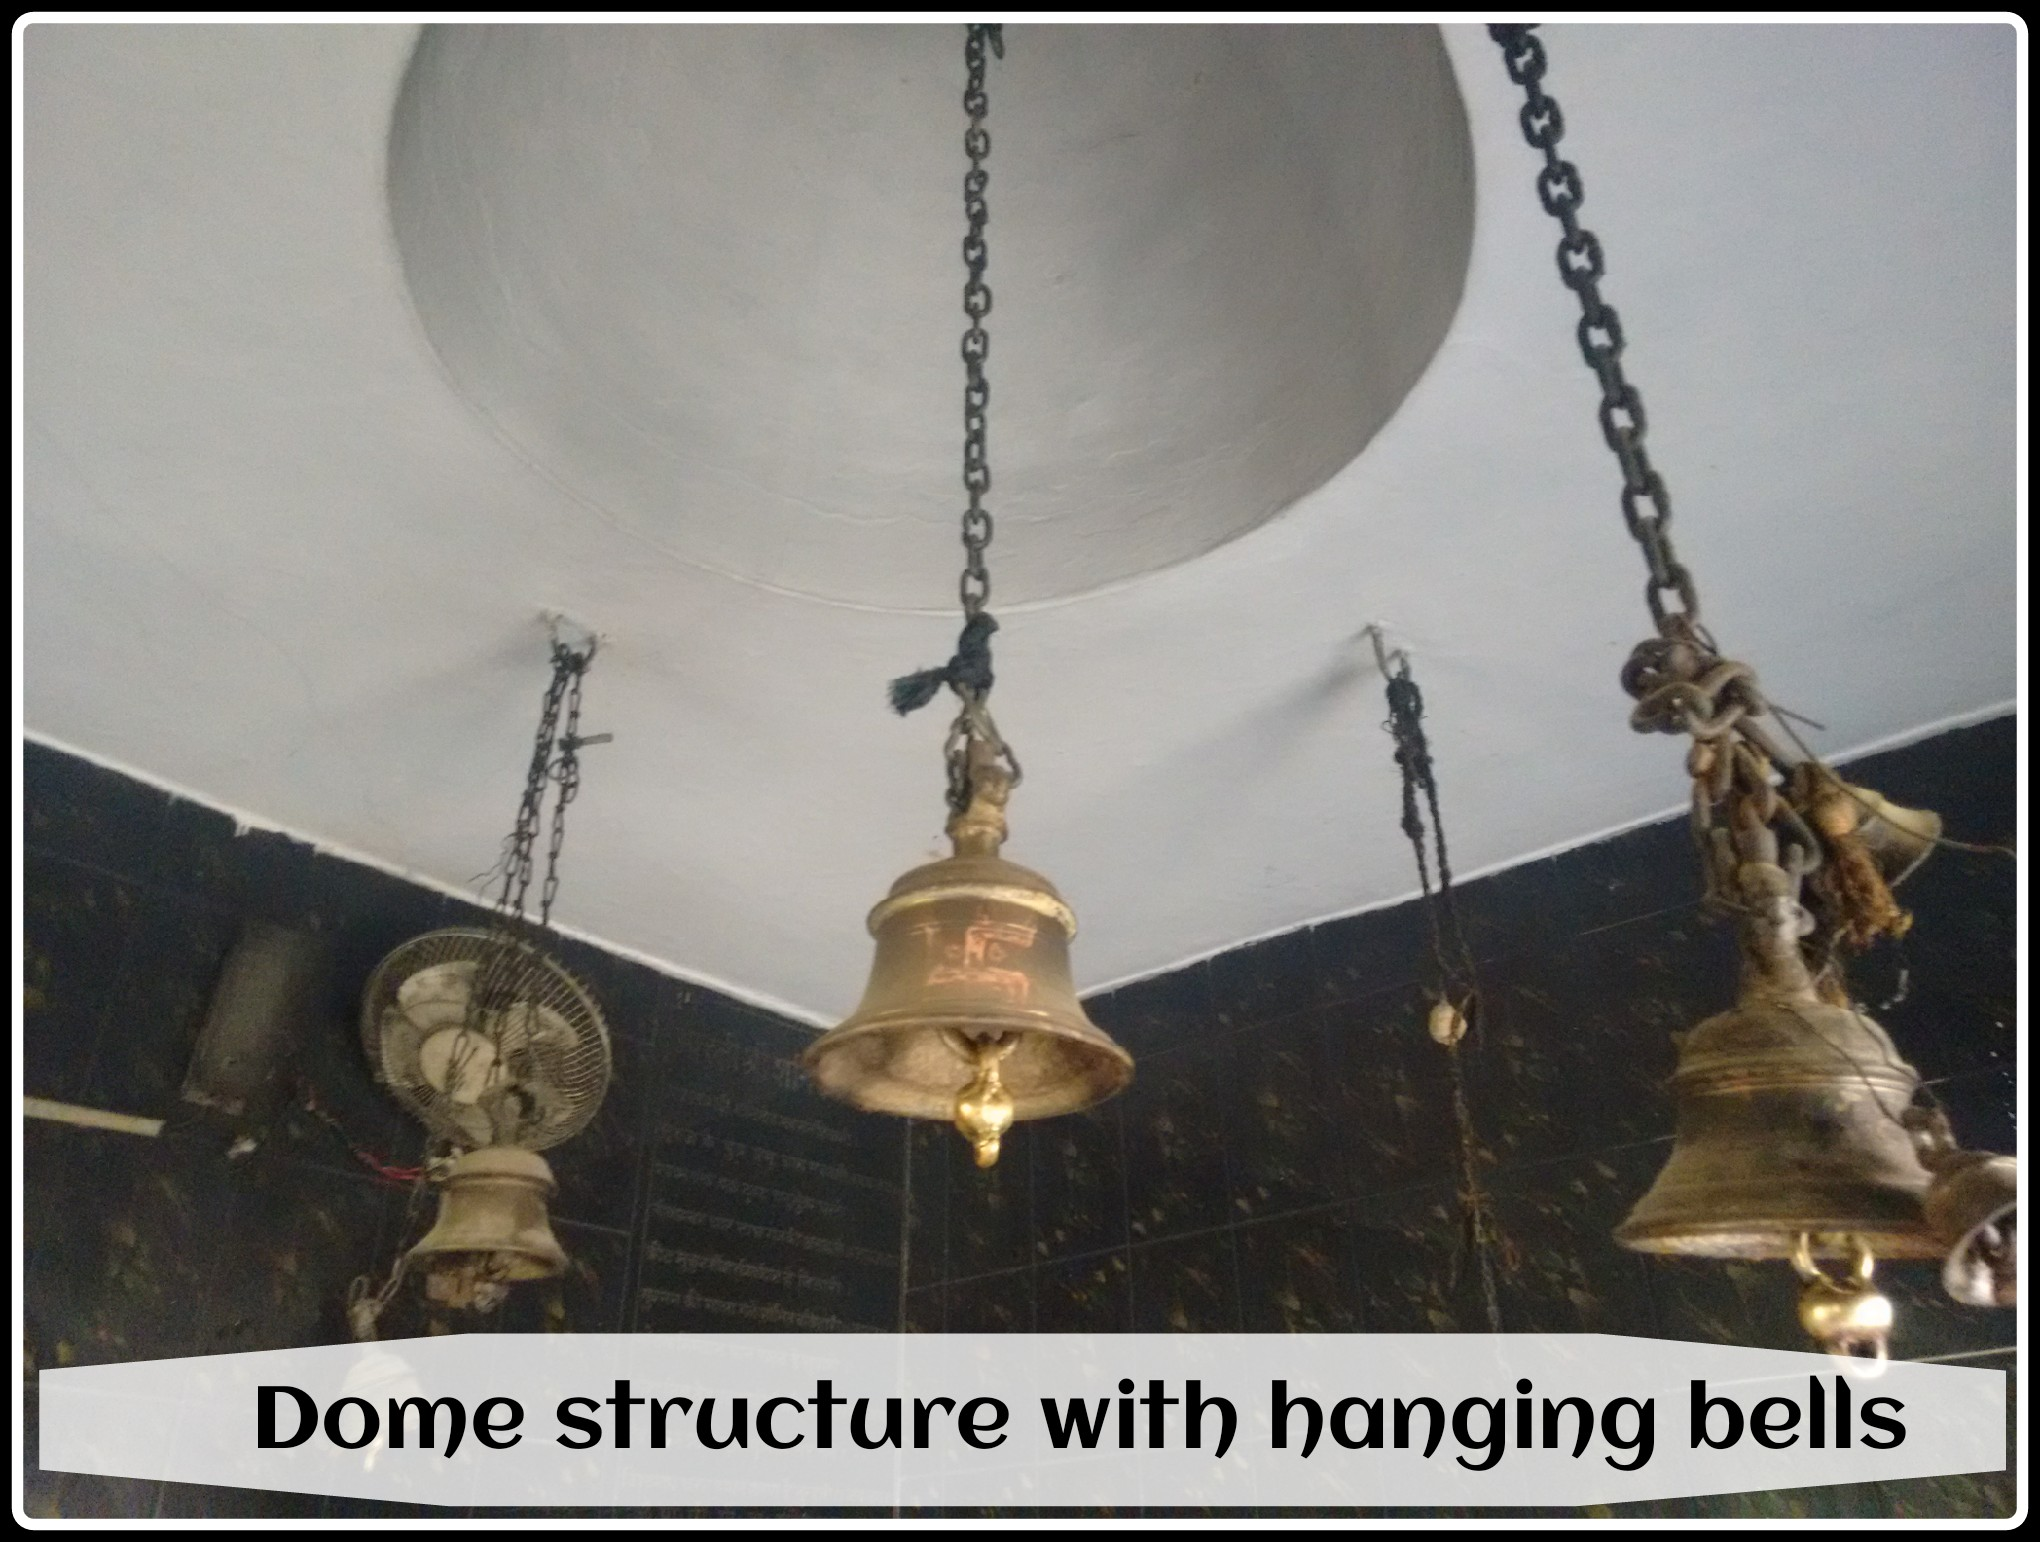 The hanging bells